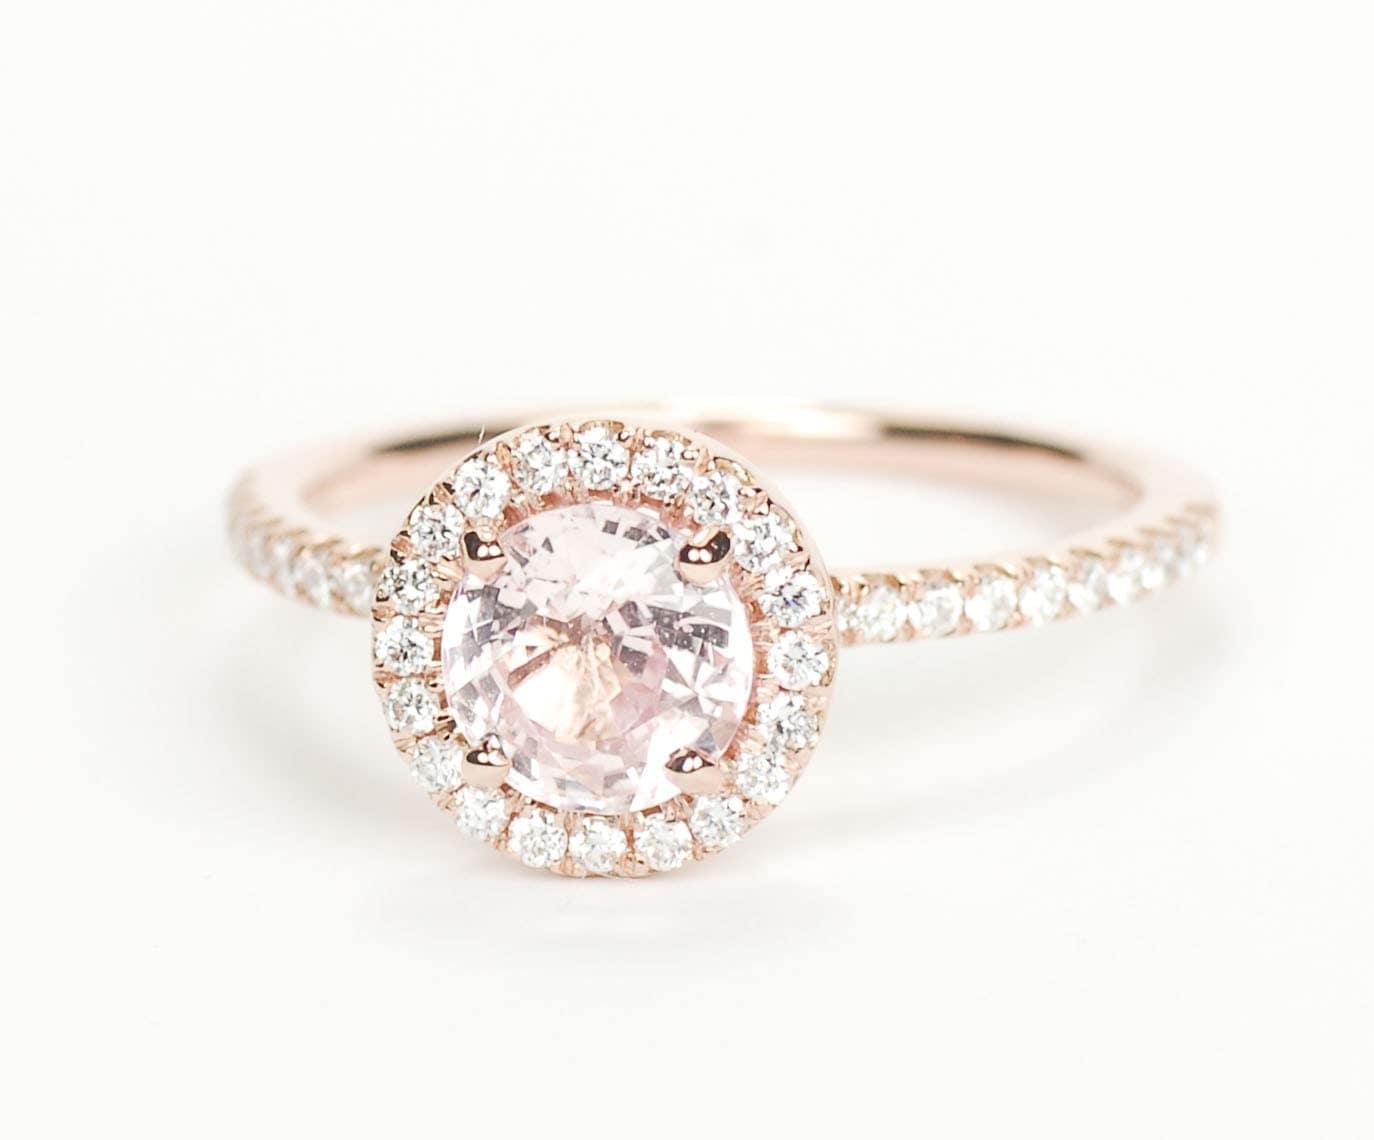 Sale Certified Peach Pink Round Sapphire Diamond Halo